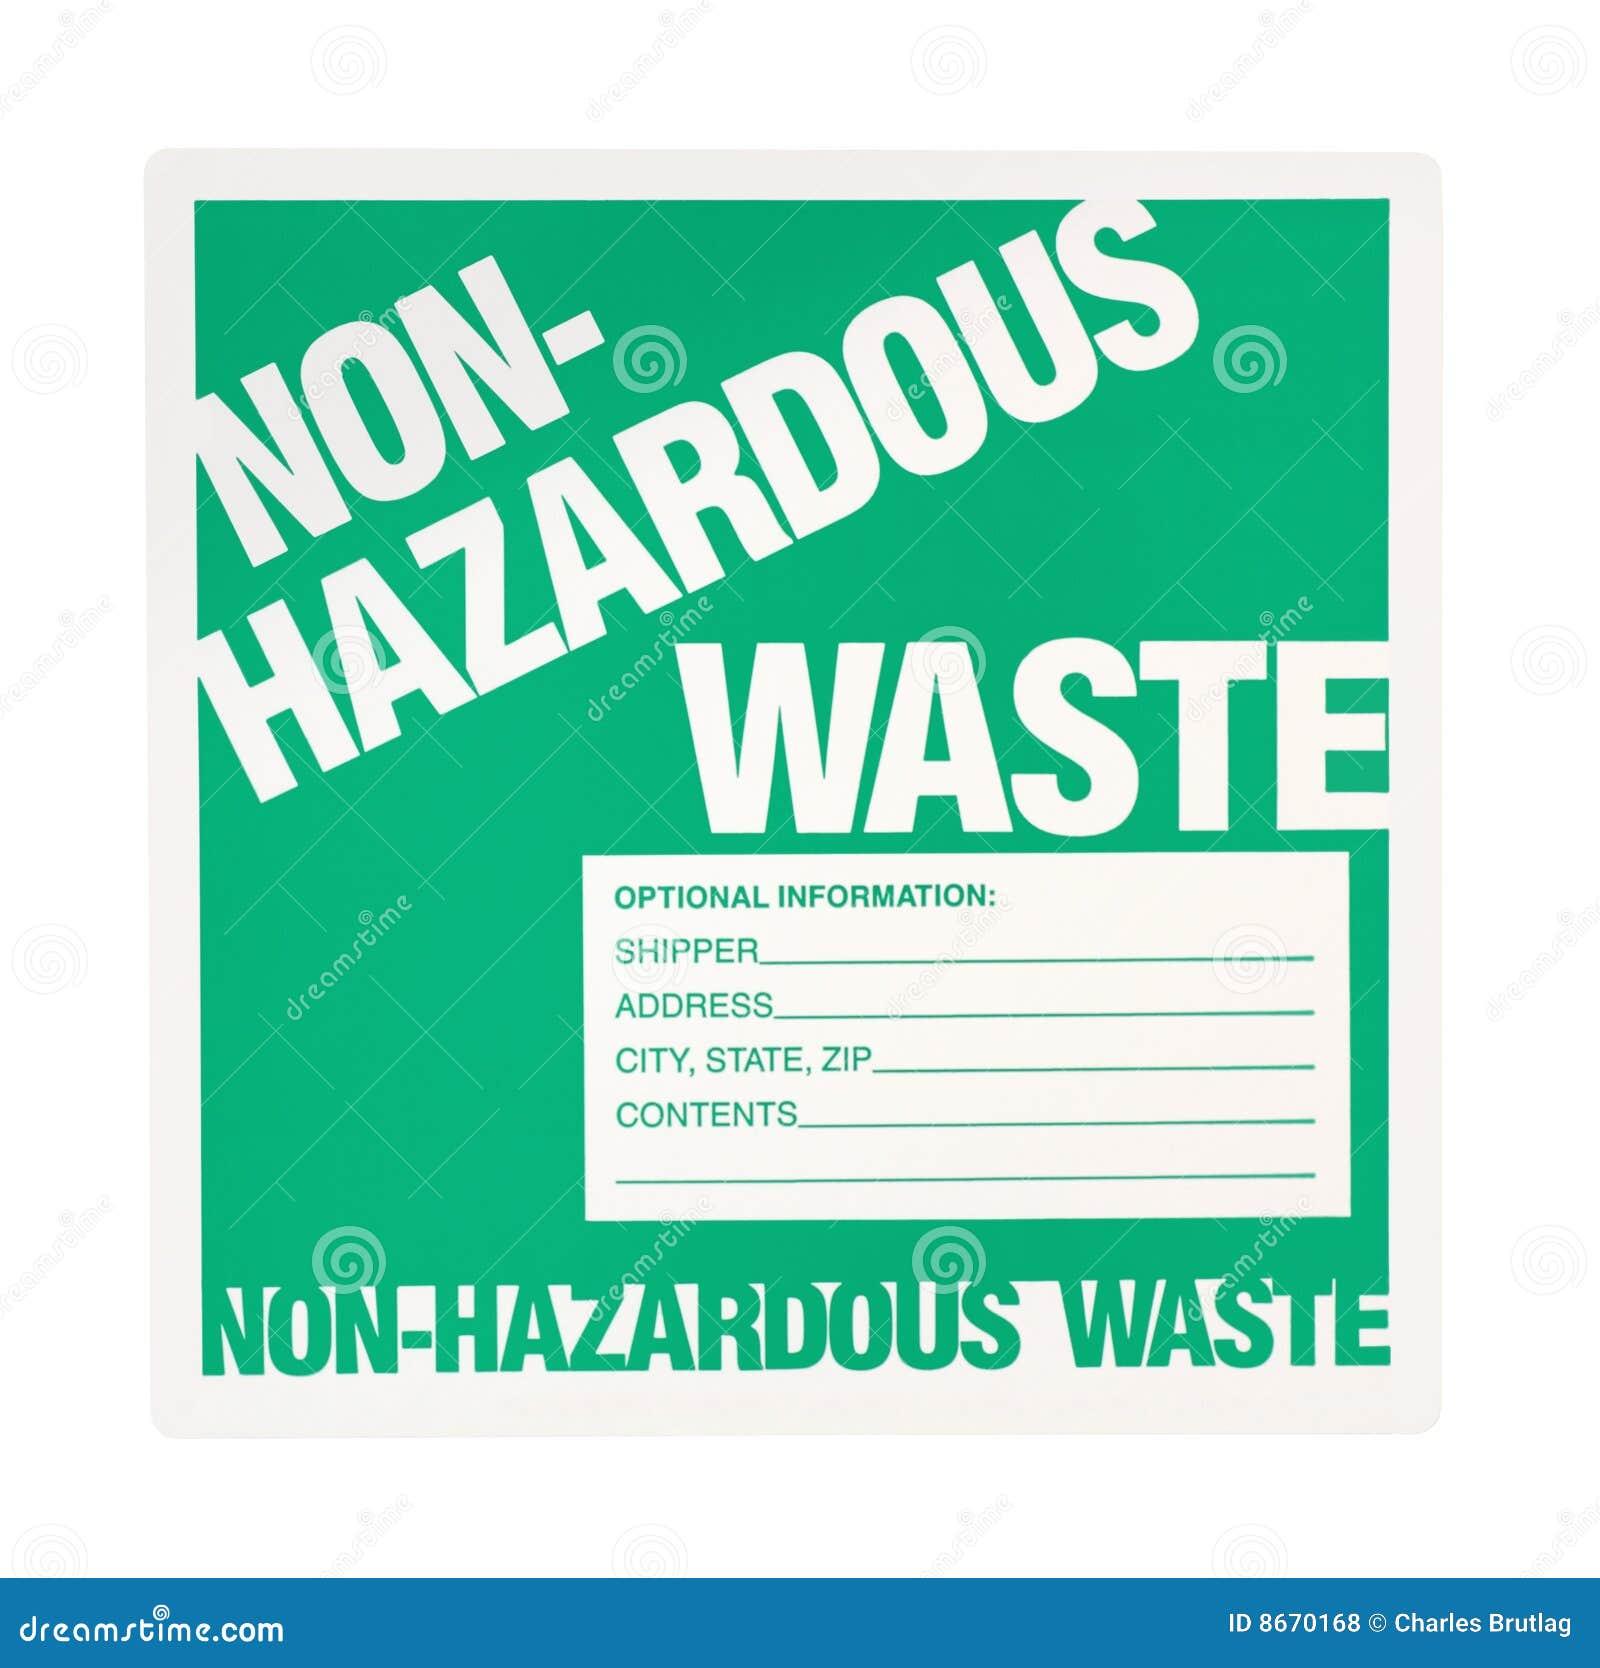 All Hazards Waste Management Planning Wmp Tool: Non-hazardous Waste Label Royalty Free Stock Photos